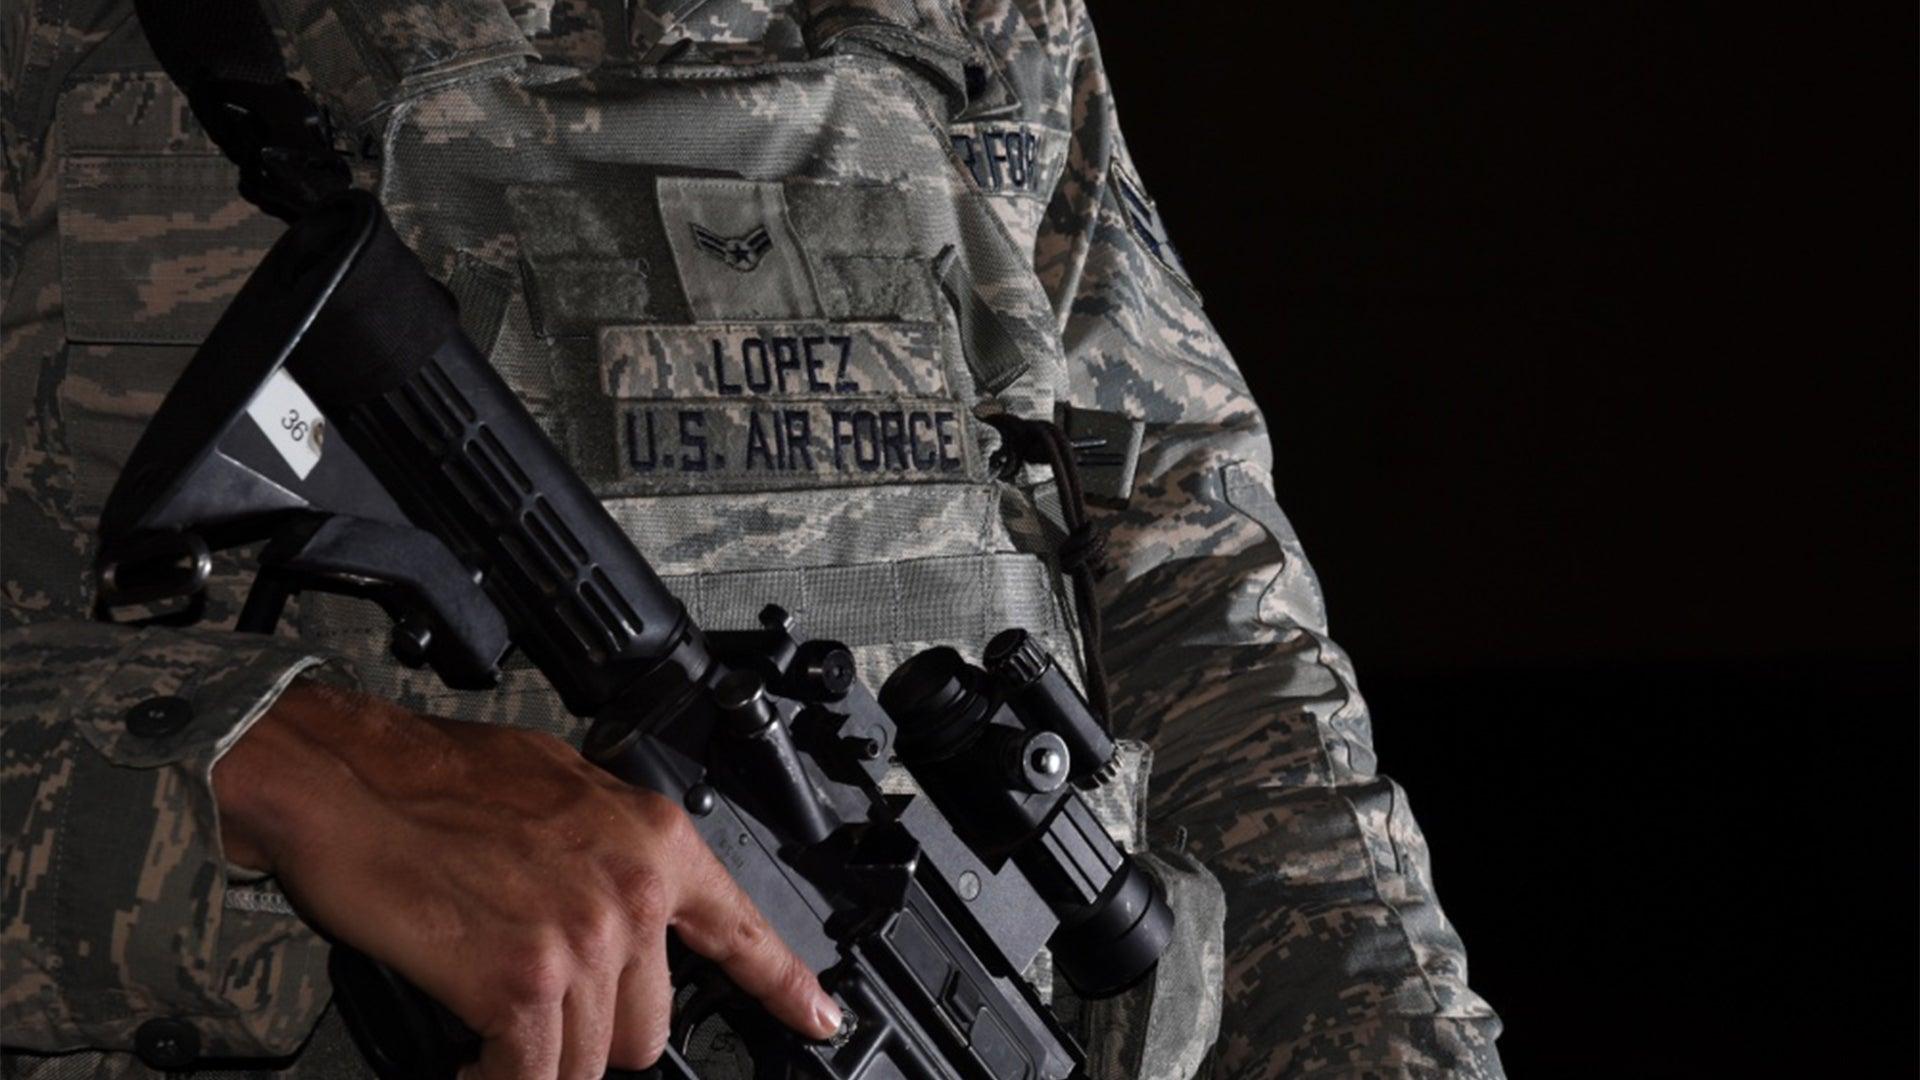 taskandpurpose.com: Air Force expands racial disparity review to include Asians, Latinx